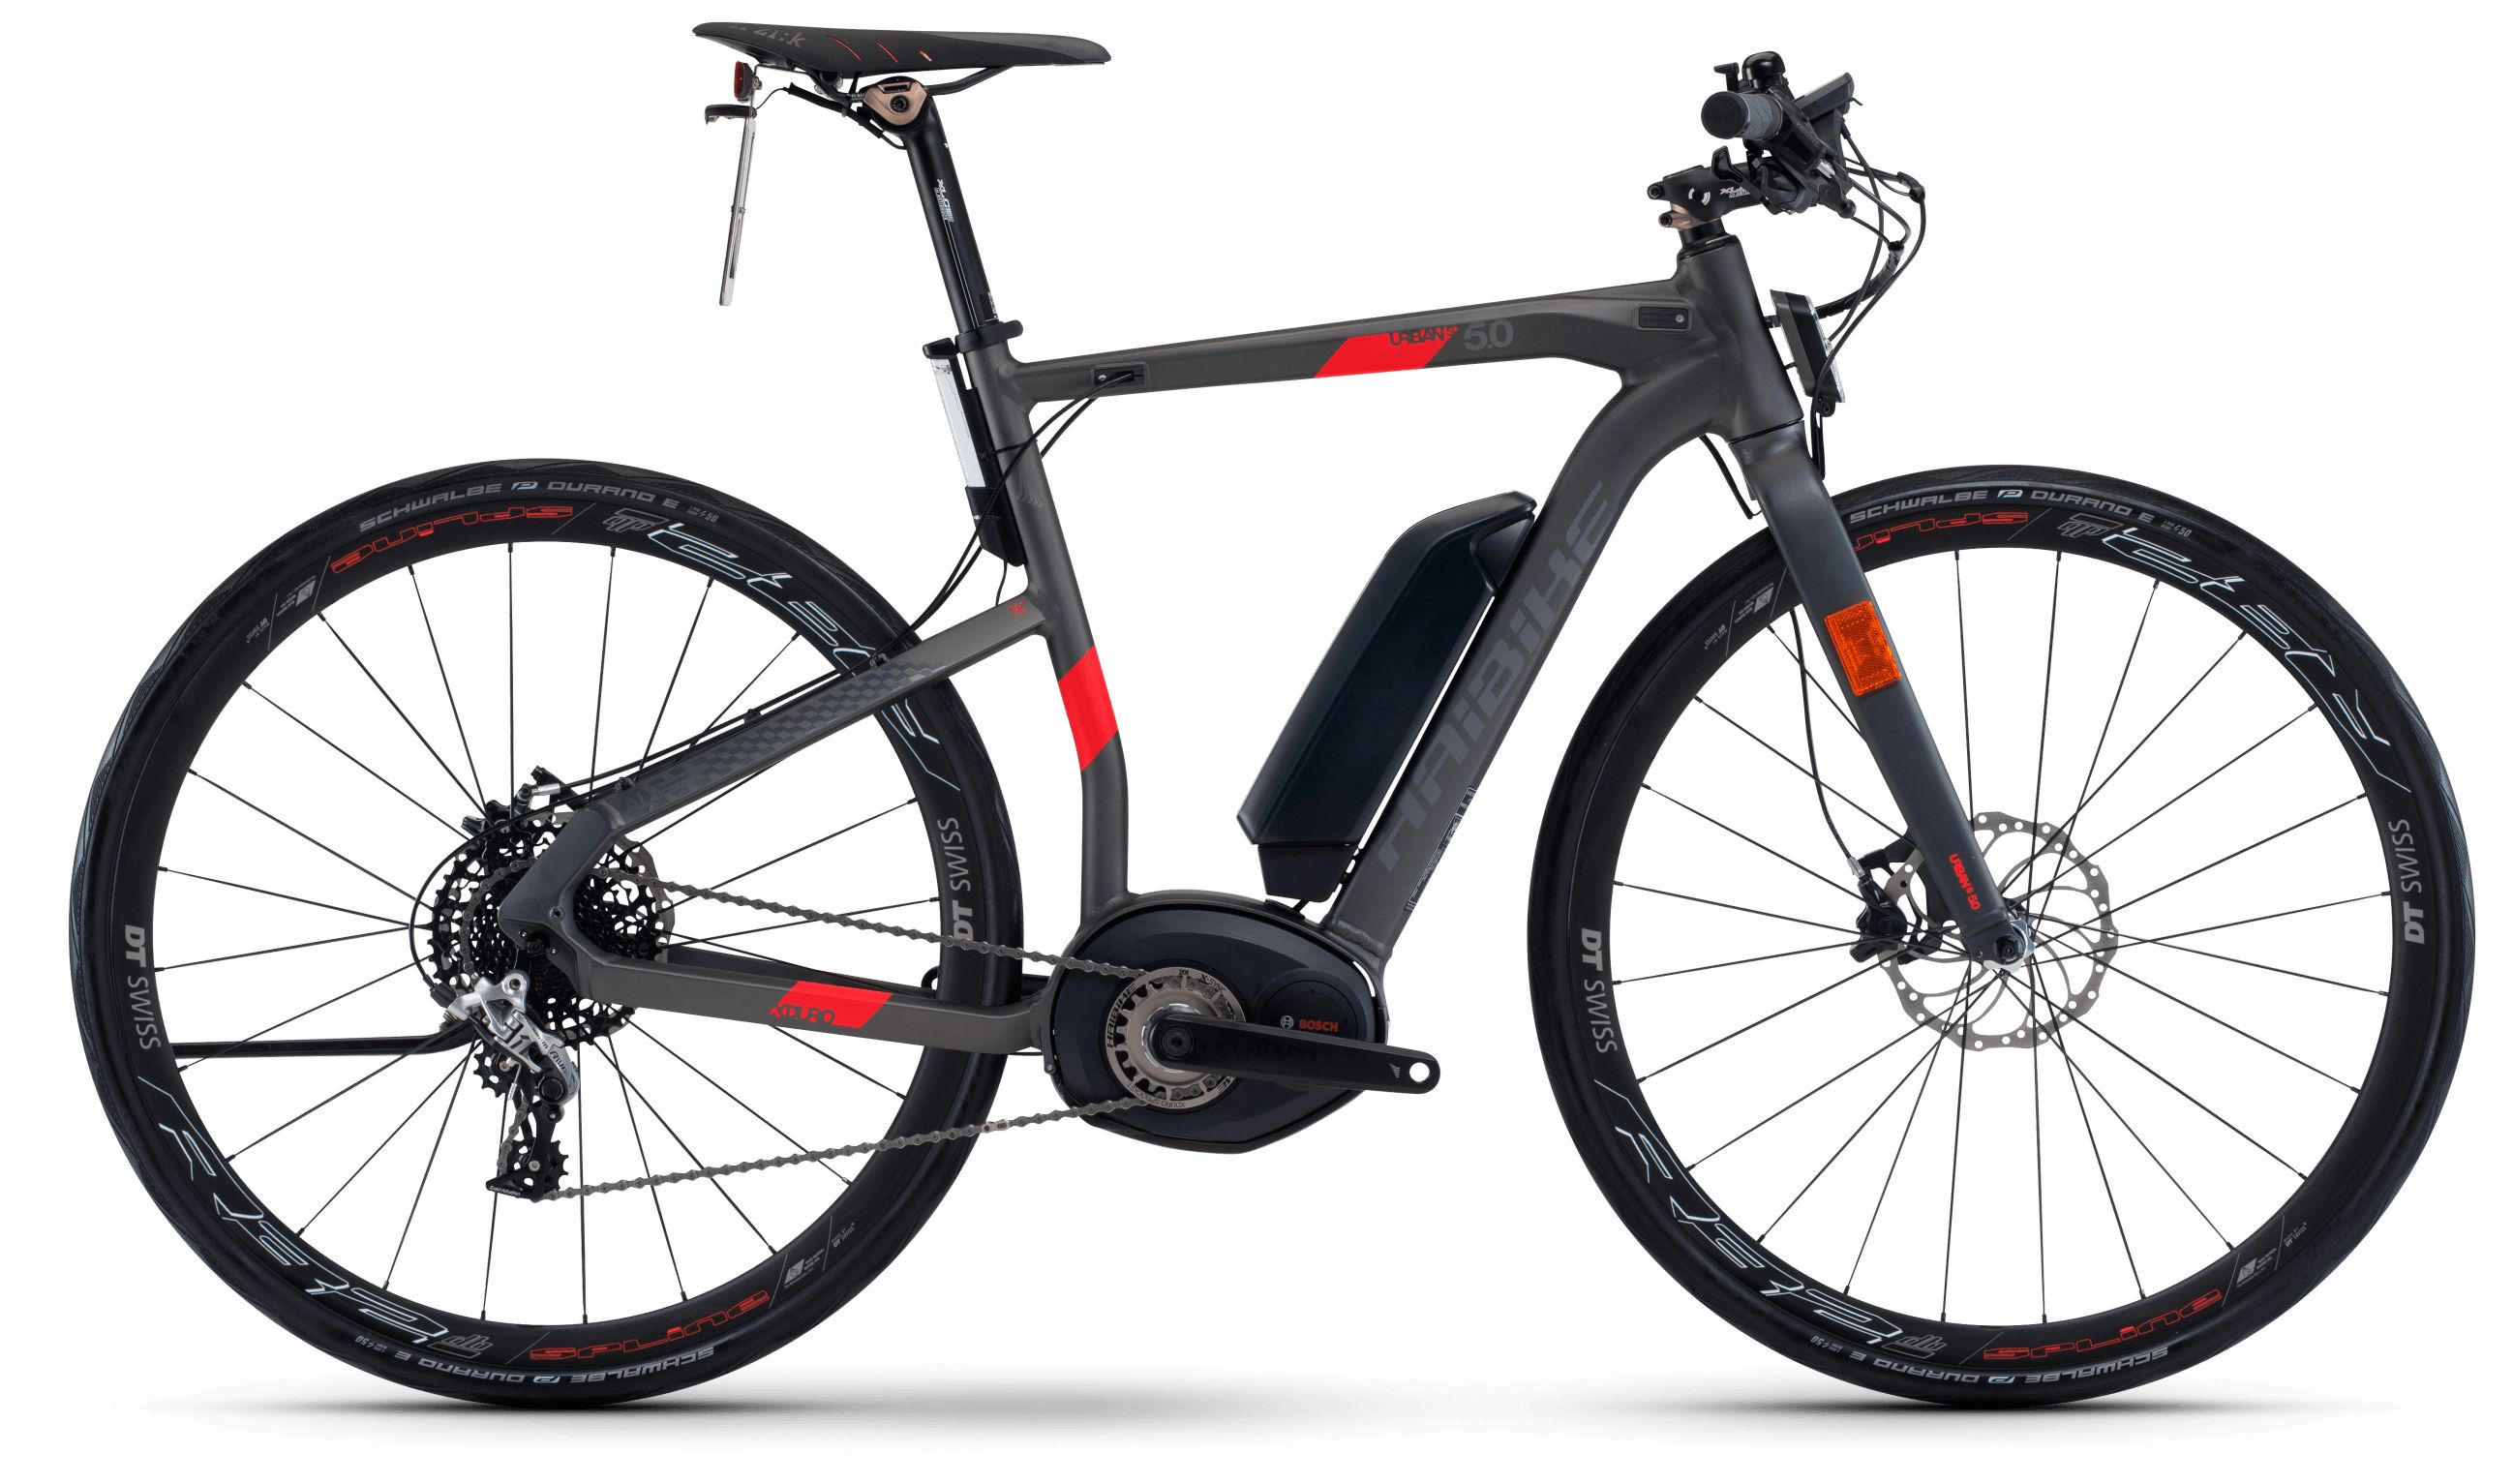 где купить Велосипед Haibike Xduro Urban S 5.0 500Wh 11s Rival 2018 по лучшей цене